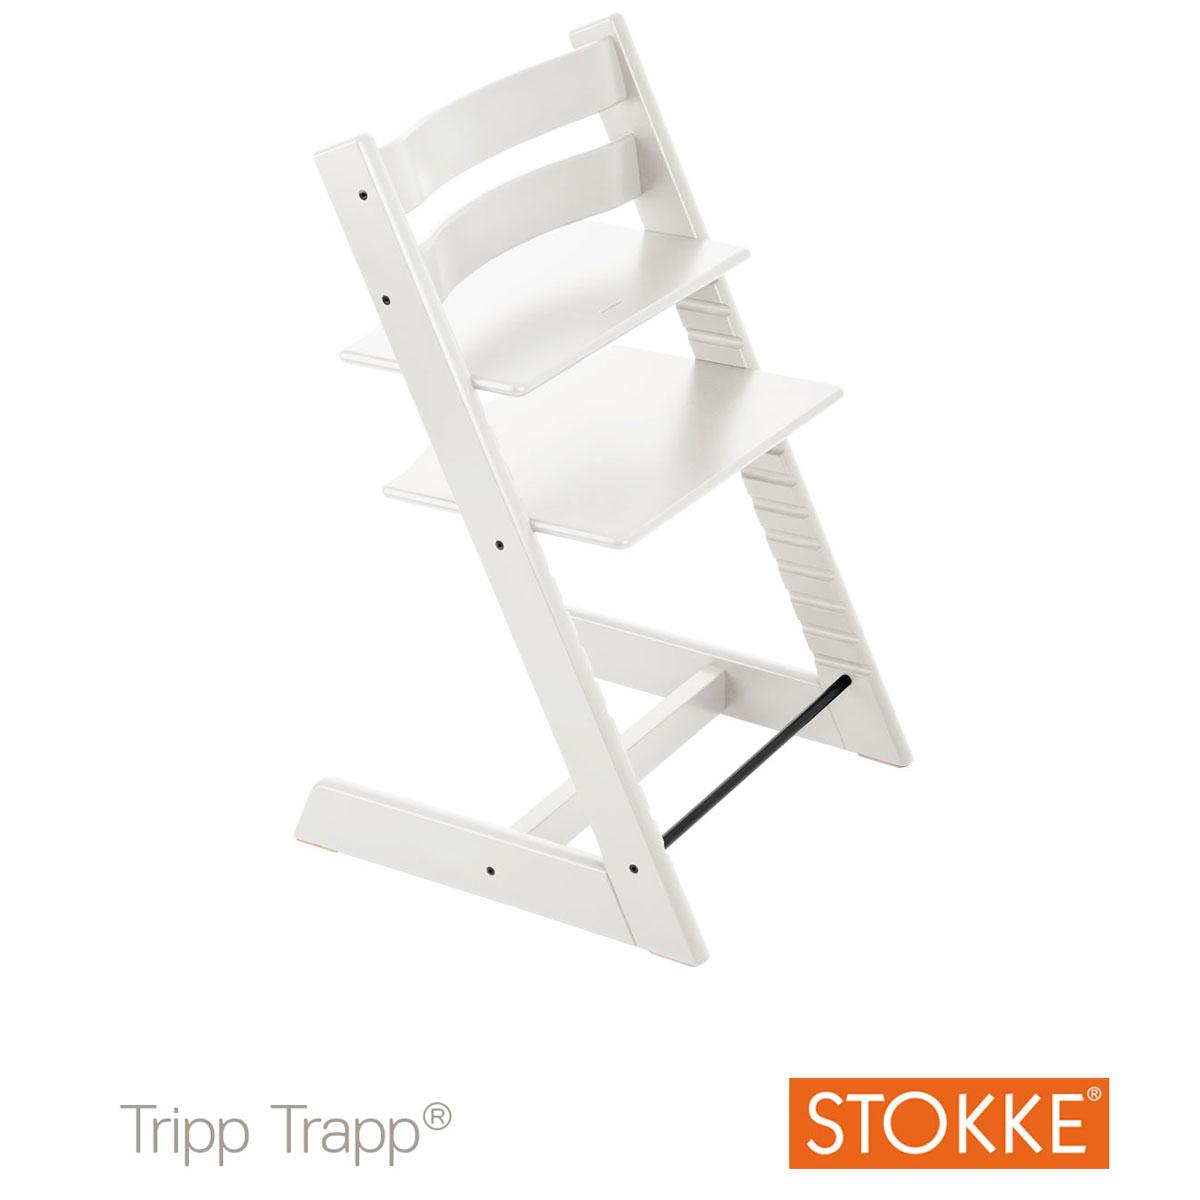 chaise haute tripp trapp de stoke